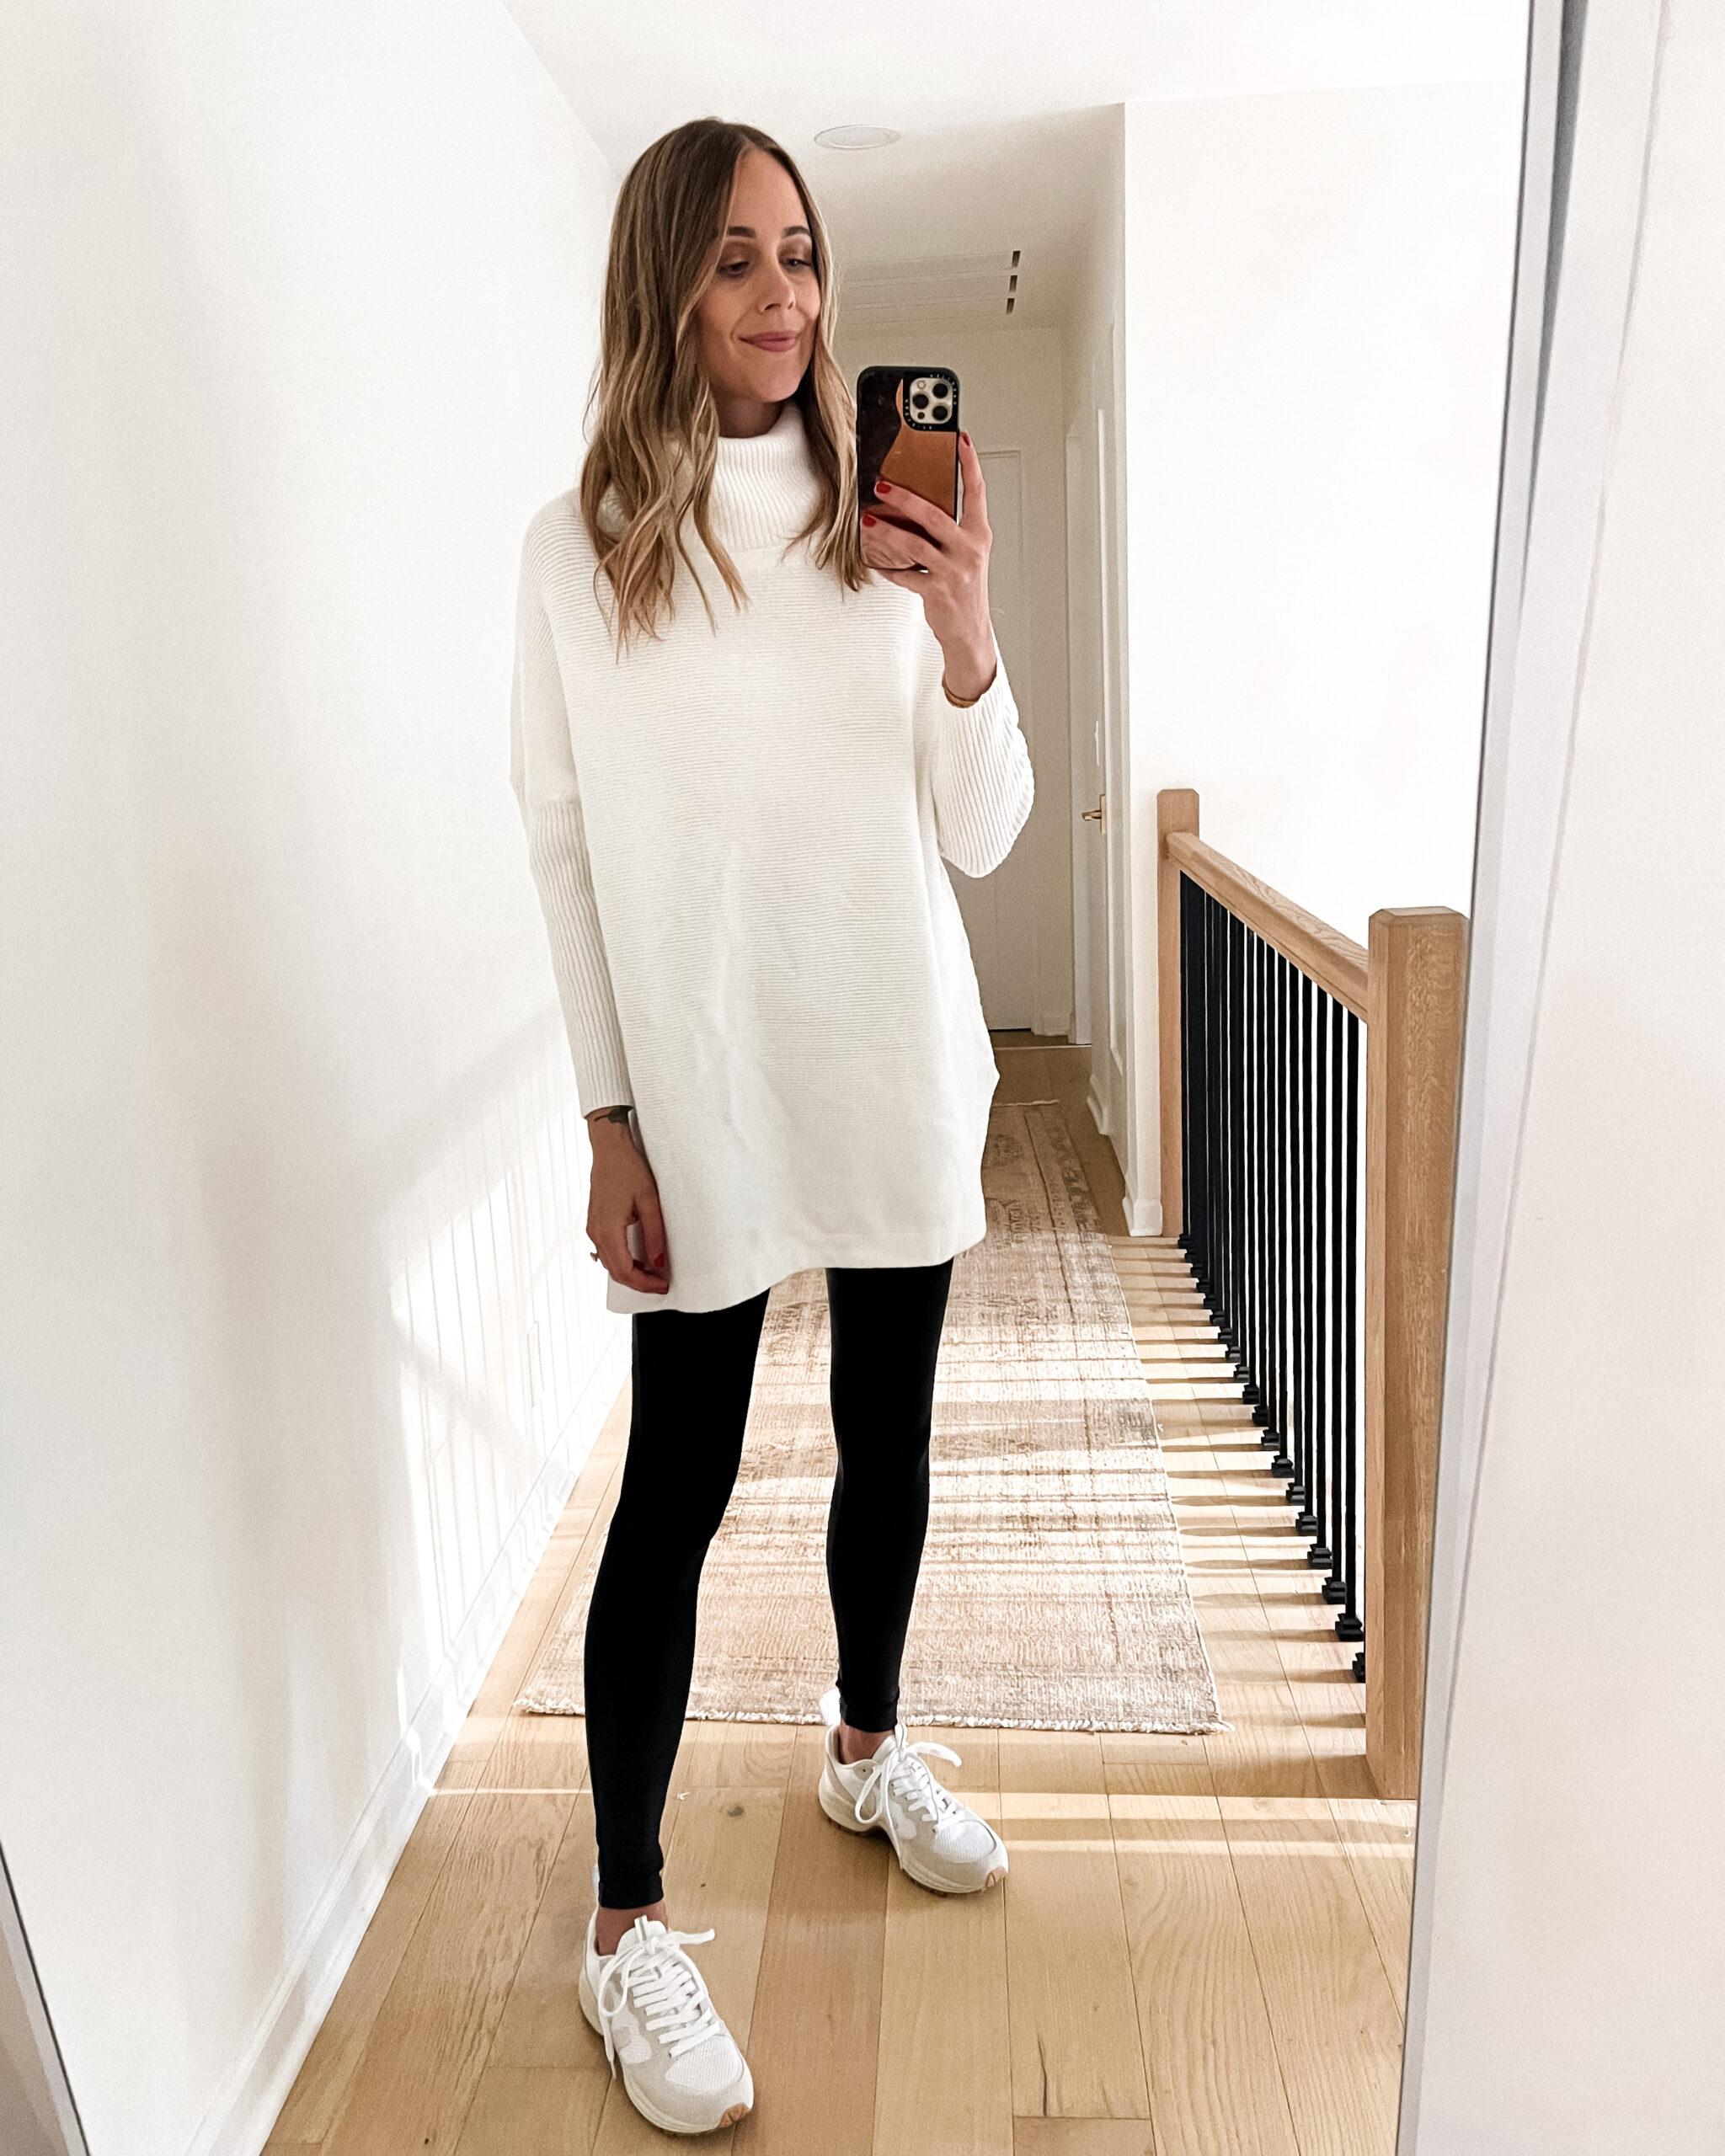 Fashion Jackson Wearing Amazon Fashion White Tunic Turtleneck Sweater Black Leggings White Dad Sneakers